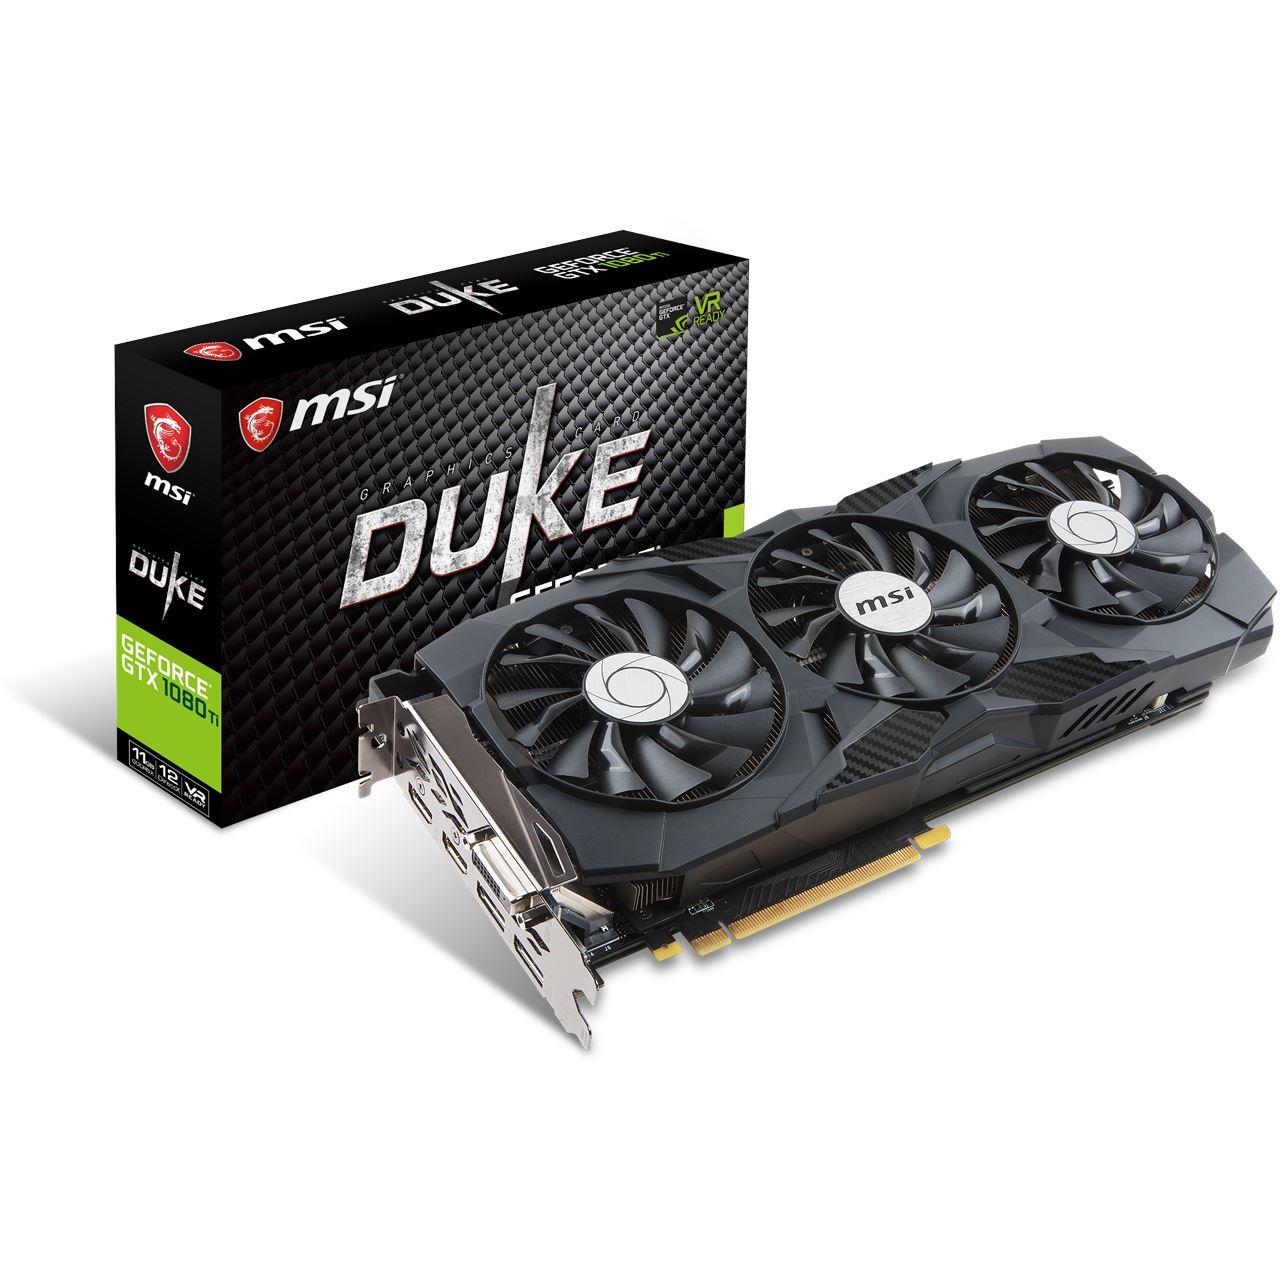 MSI GeForce GTX 1080 Ti Duke OC - 11GB